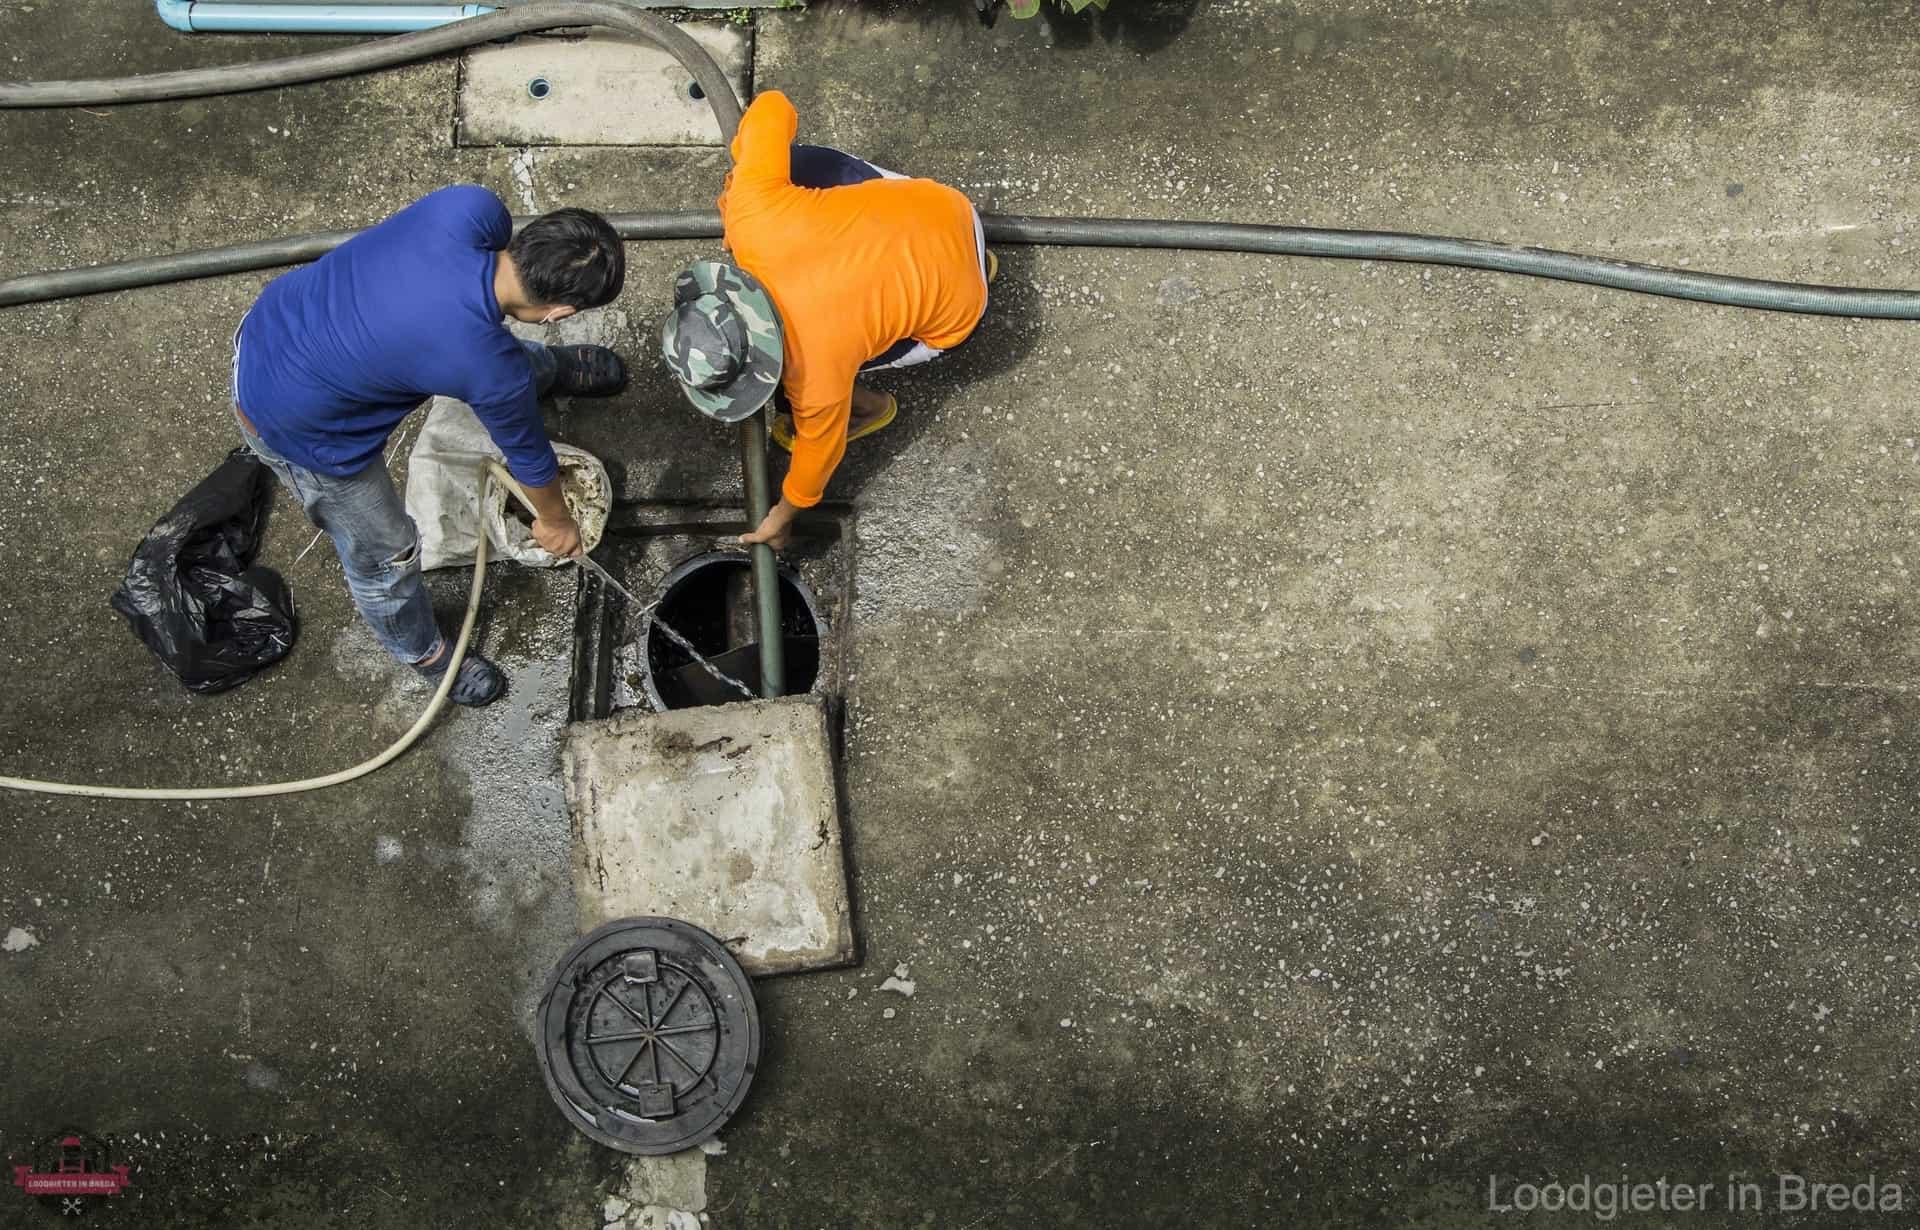 Riool inspectie loodgieter breda